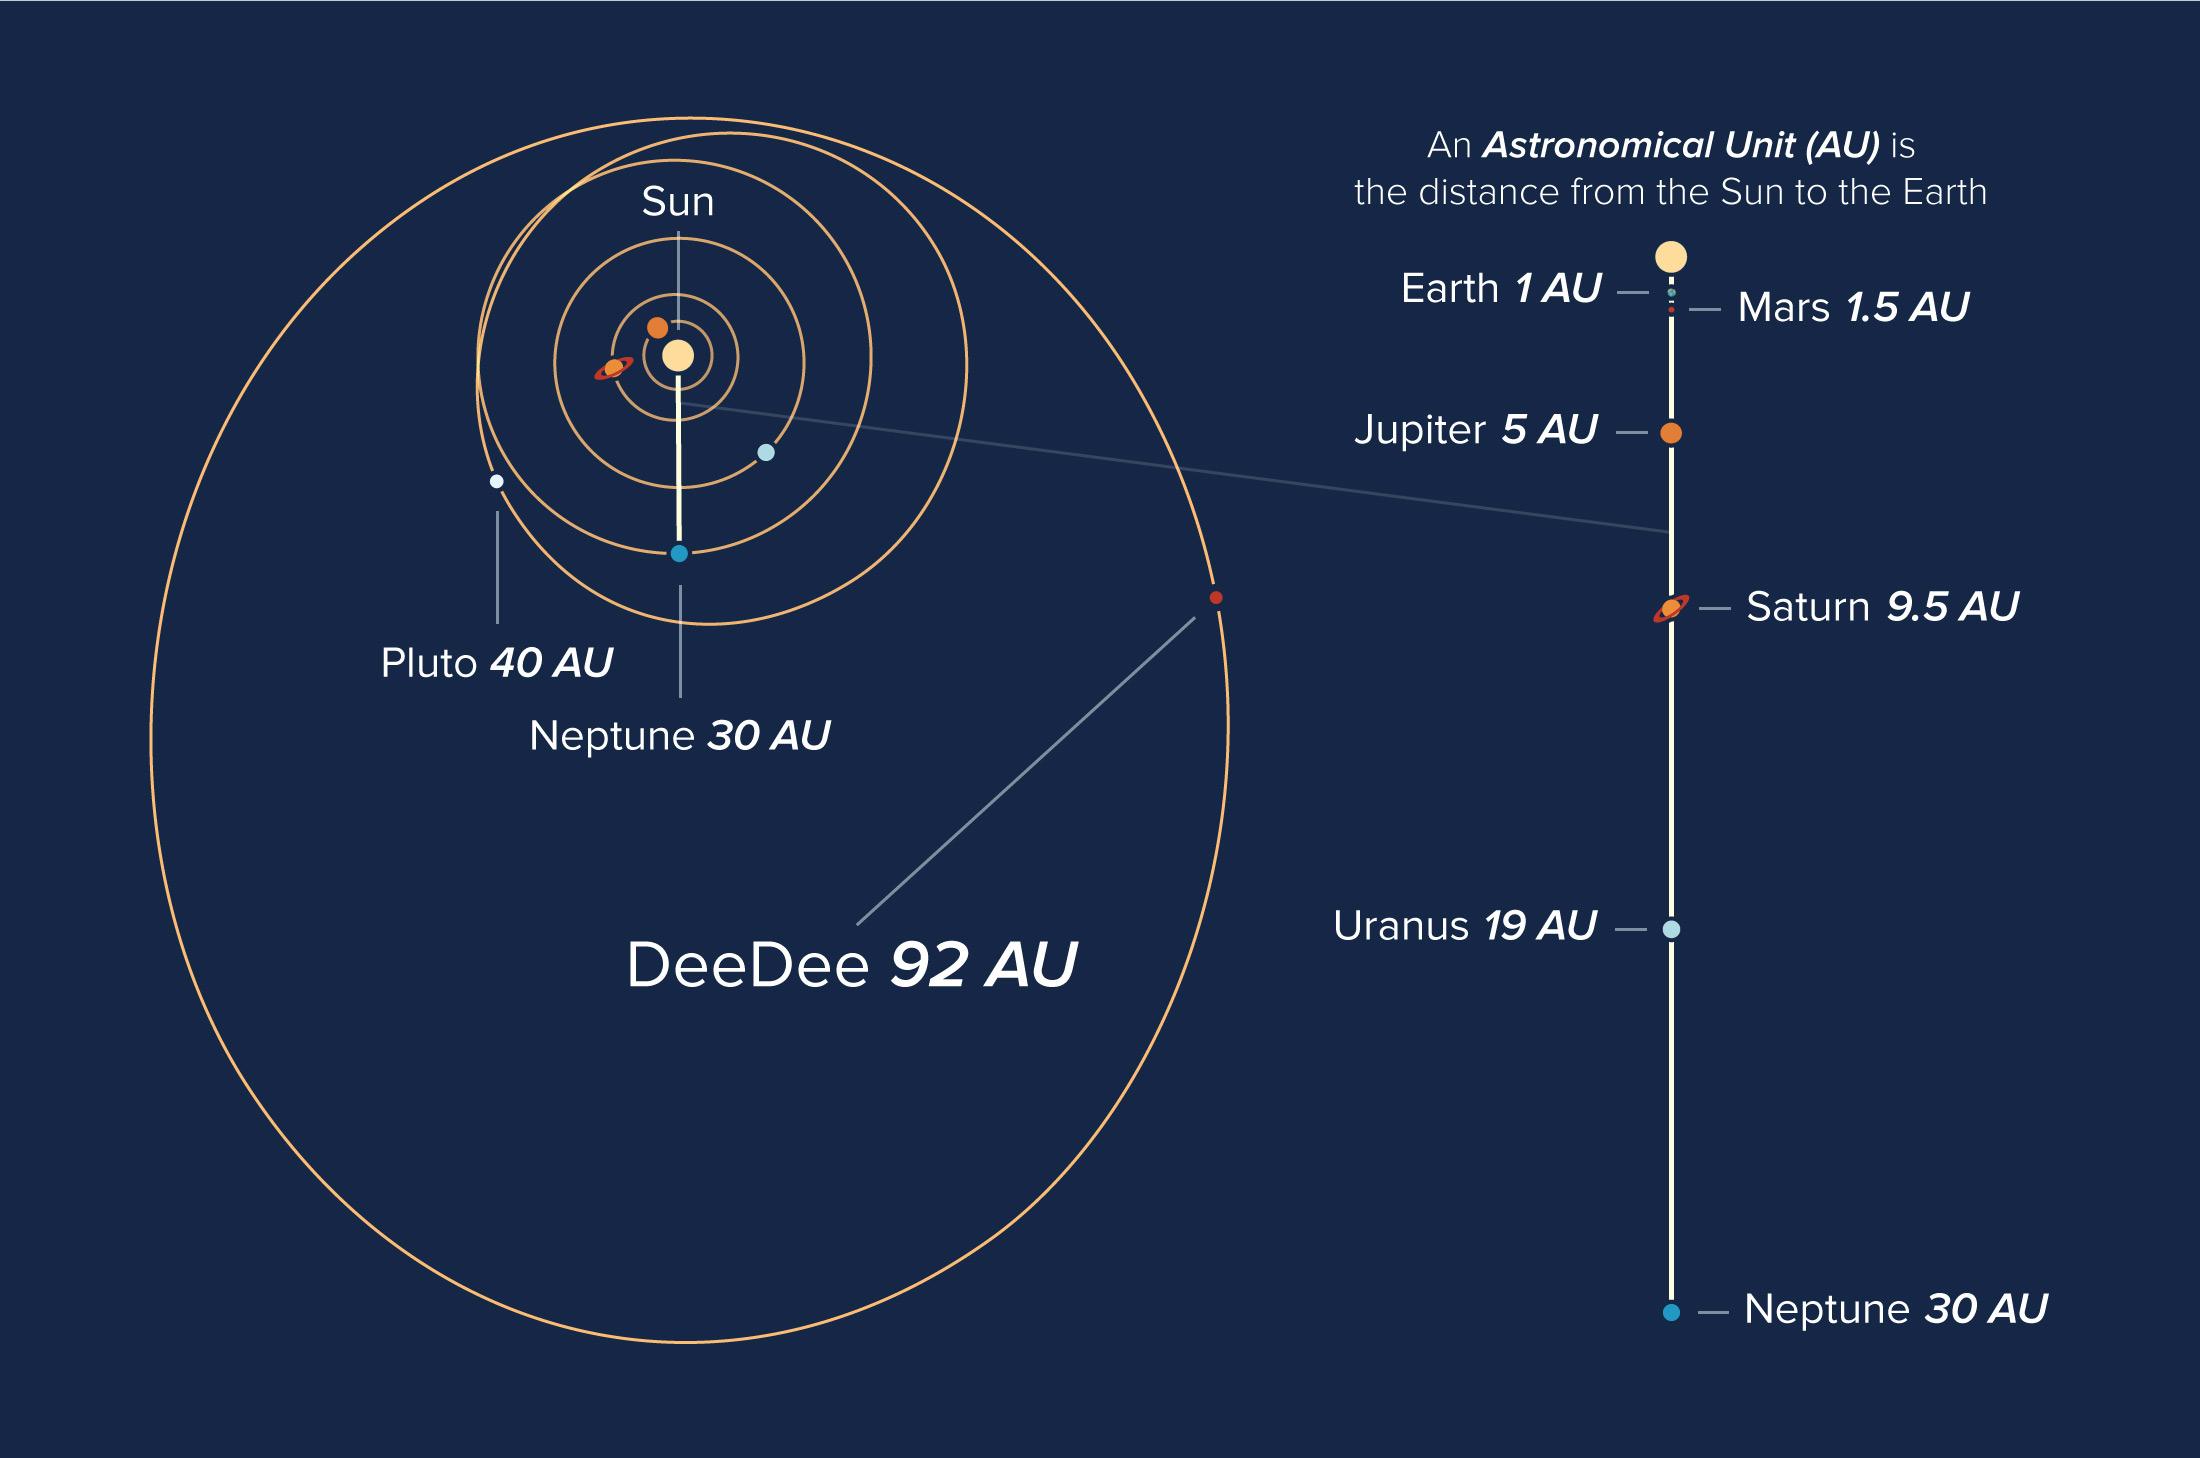 Risultati immagini per Dee Dee, alma telescope